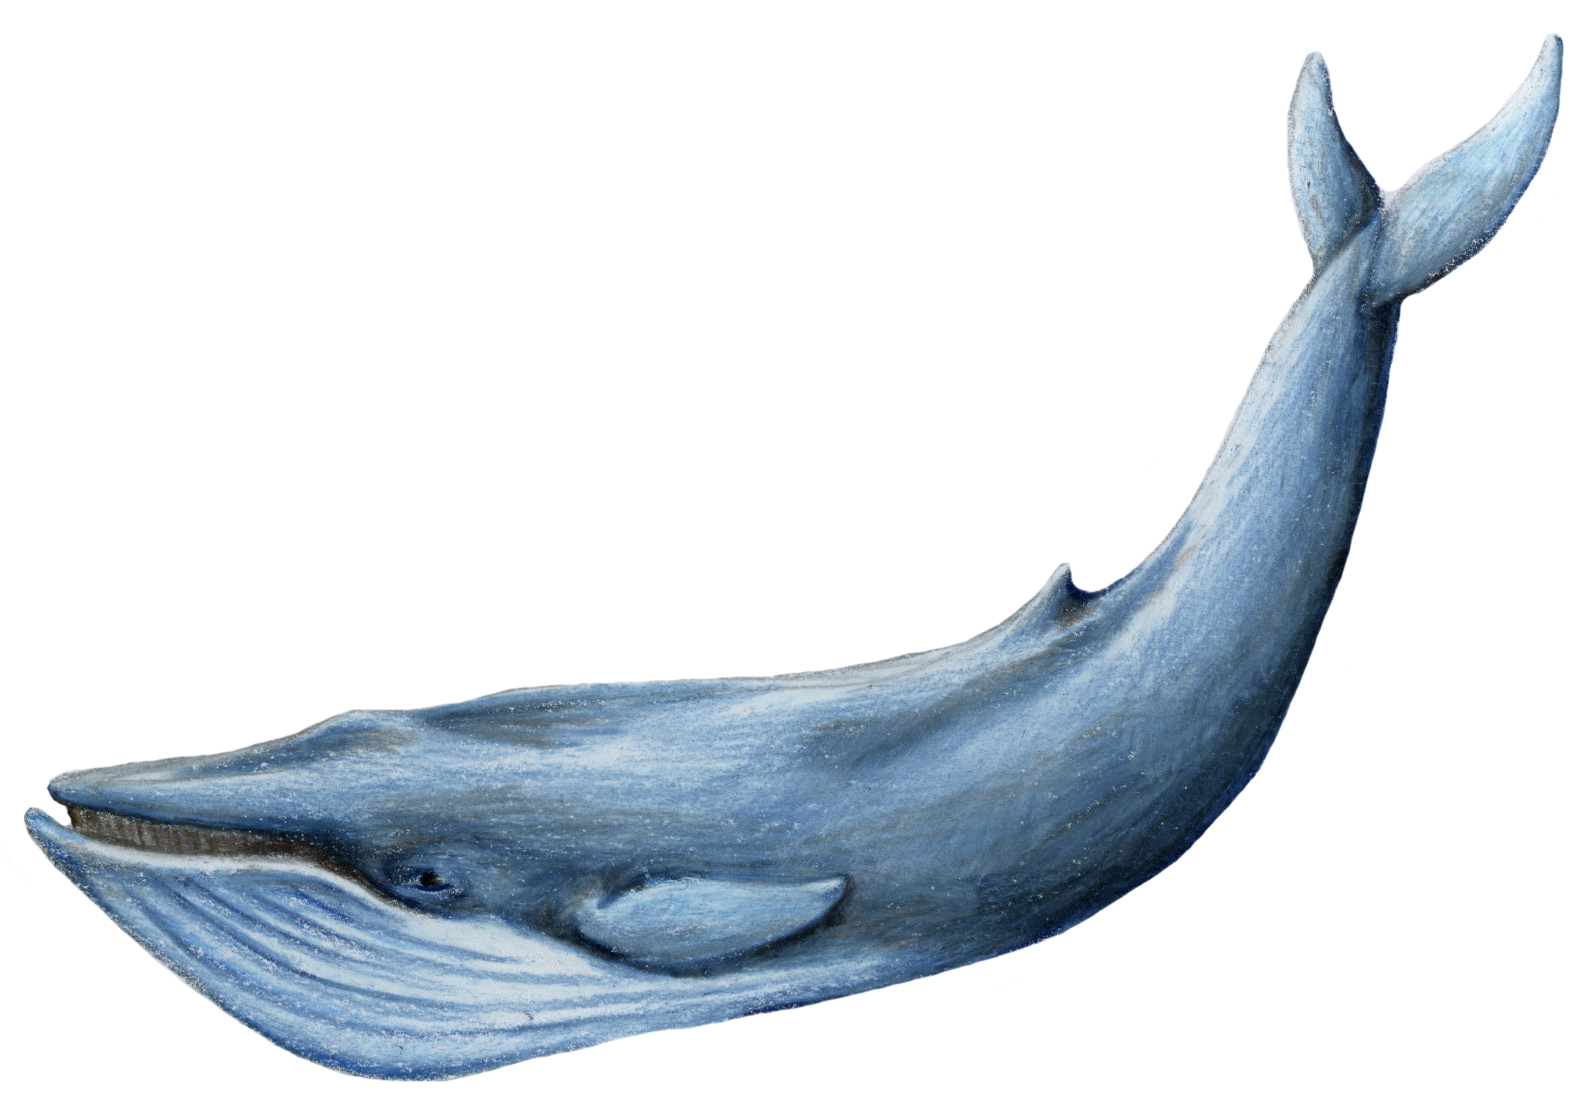 Kit 21 Tys Izobrazhenij Najdeno V Yandeks Kartinkah Whale Blue Whale Whale Pictures